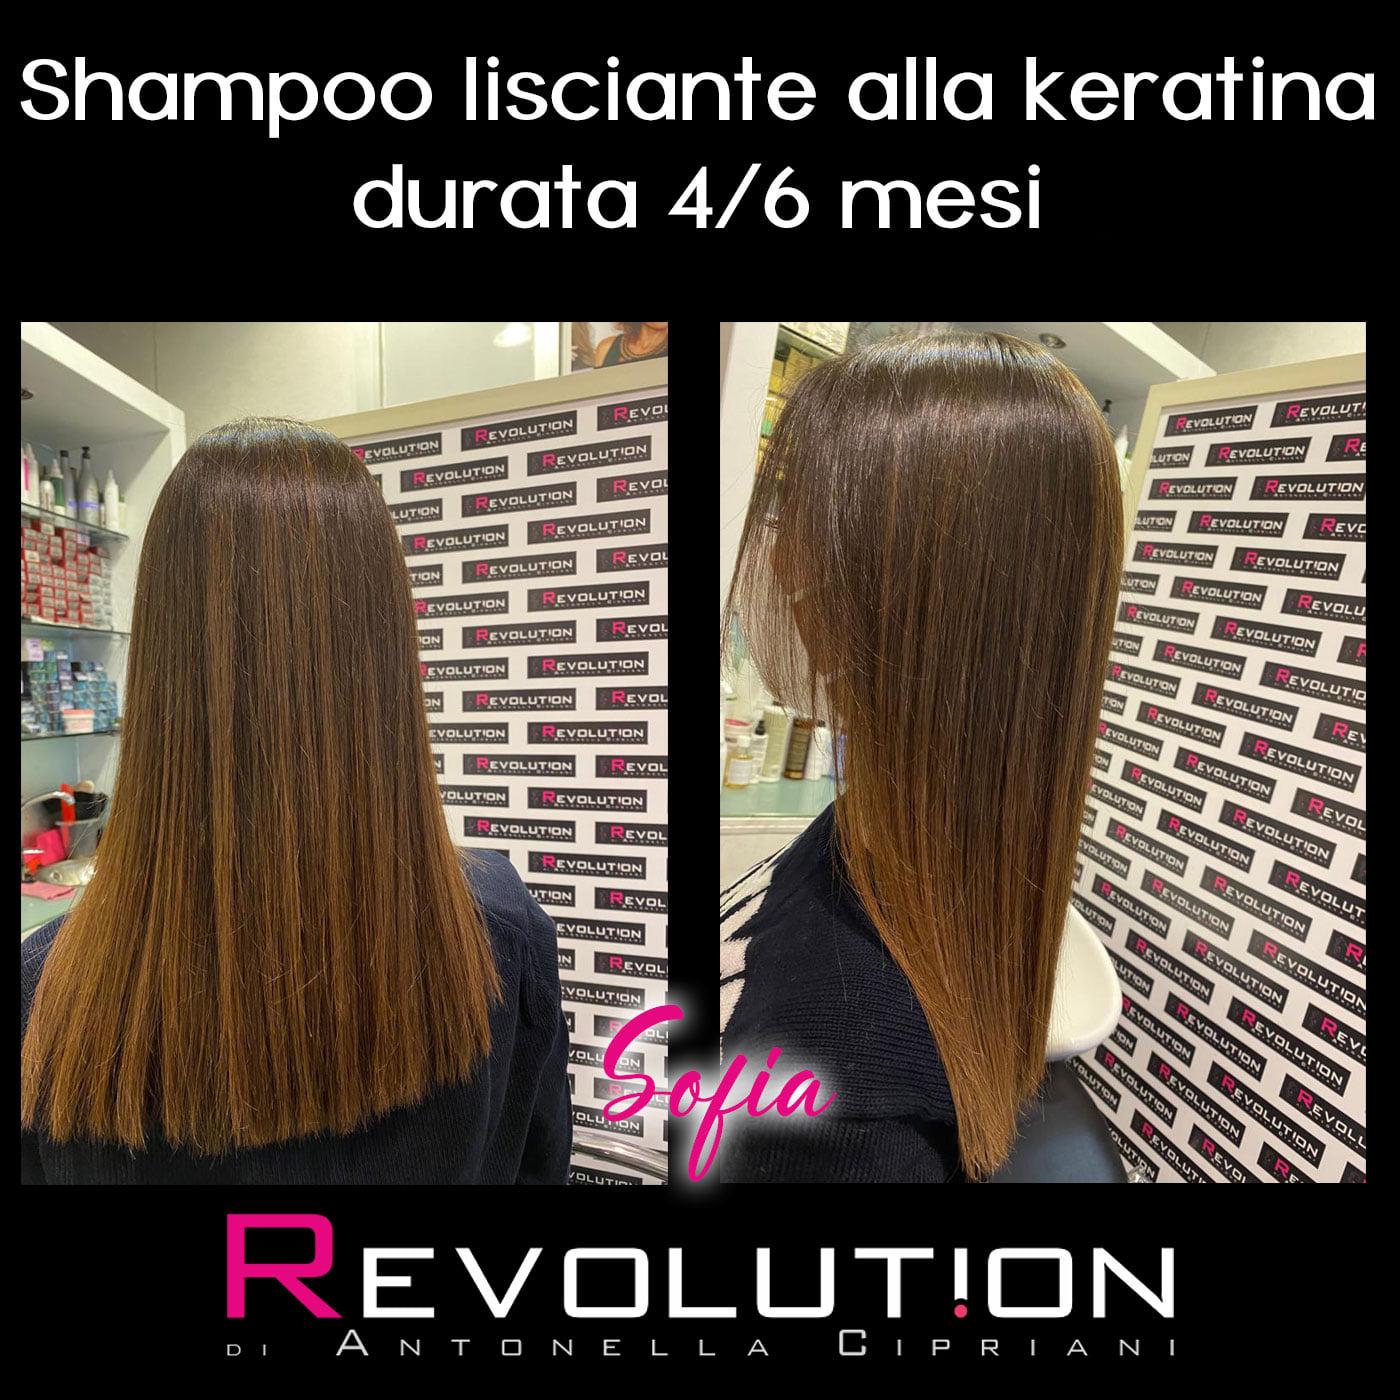 Shampoo lisciante alla keratina durata 4/6 mesi